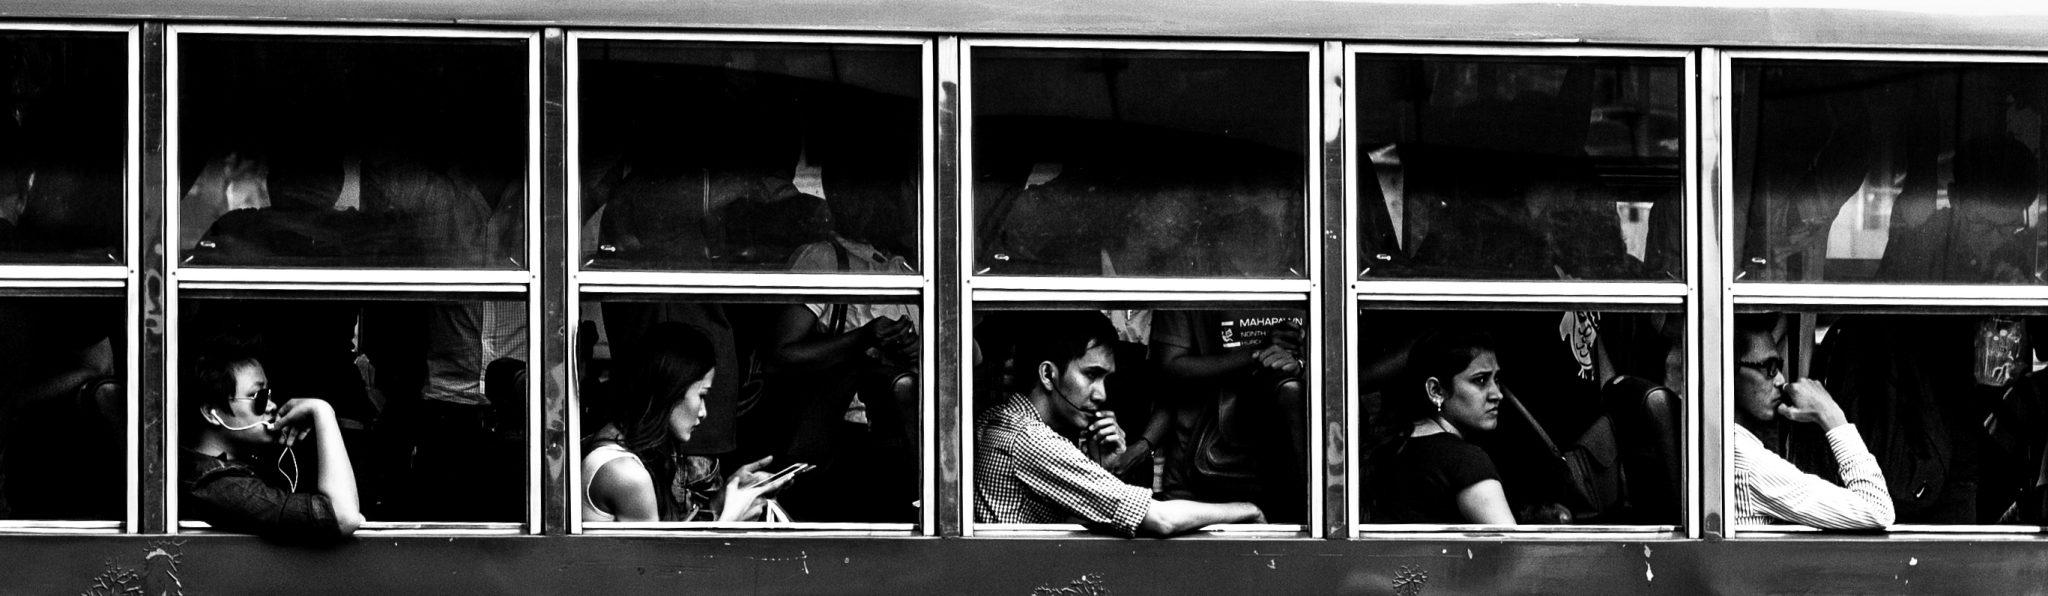 Street Fotografie | WhiteWall